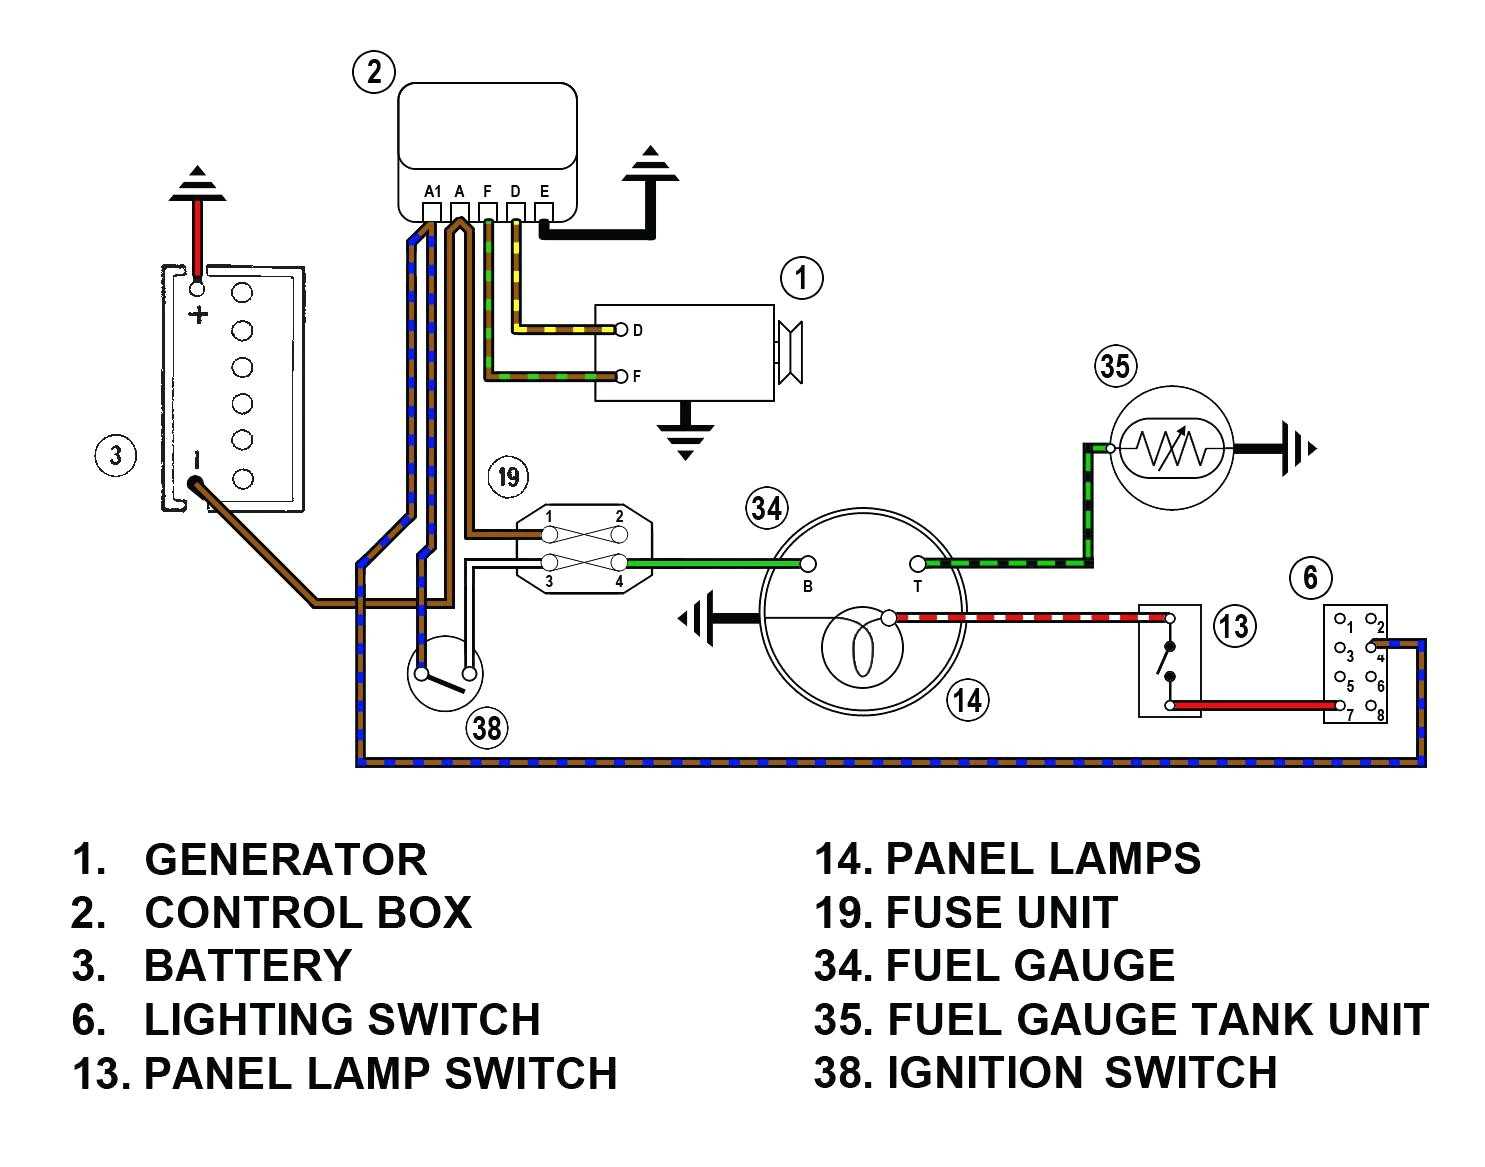 jeep cj7 fuel gauge wiring wiring diagram rows jeep fuel gauge wiring diagram for 1972